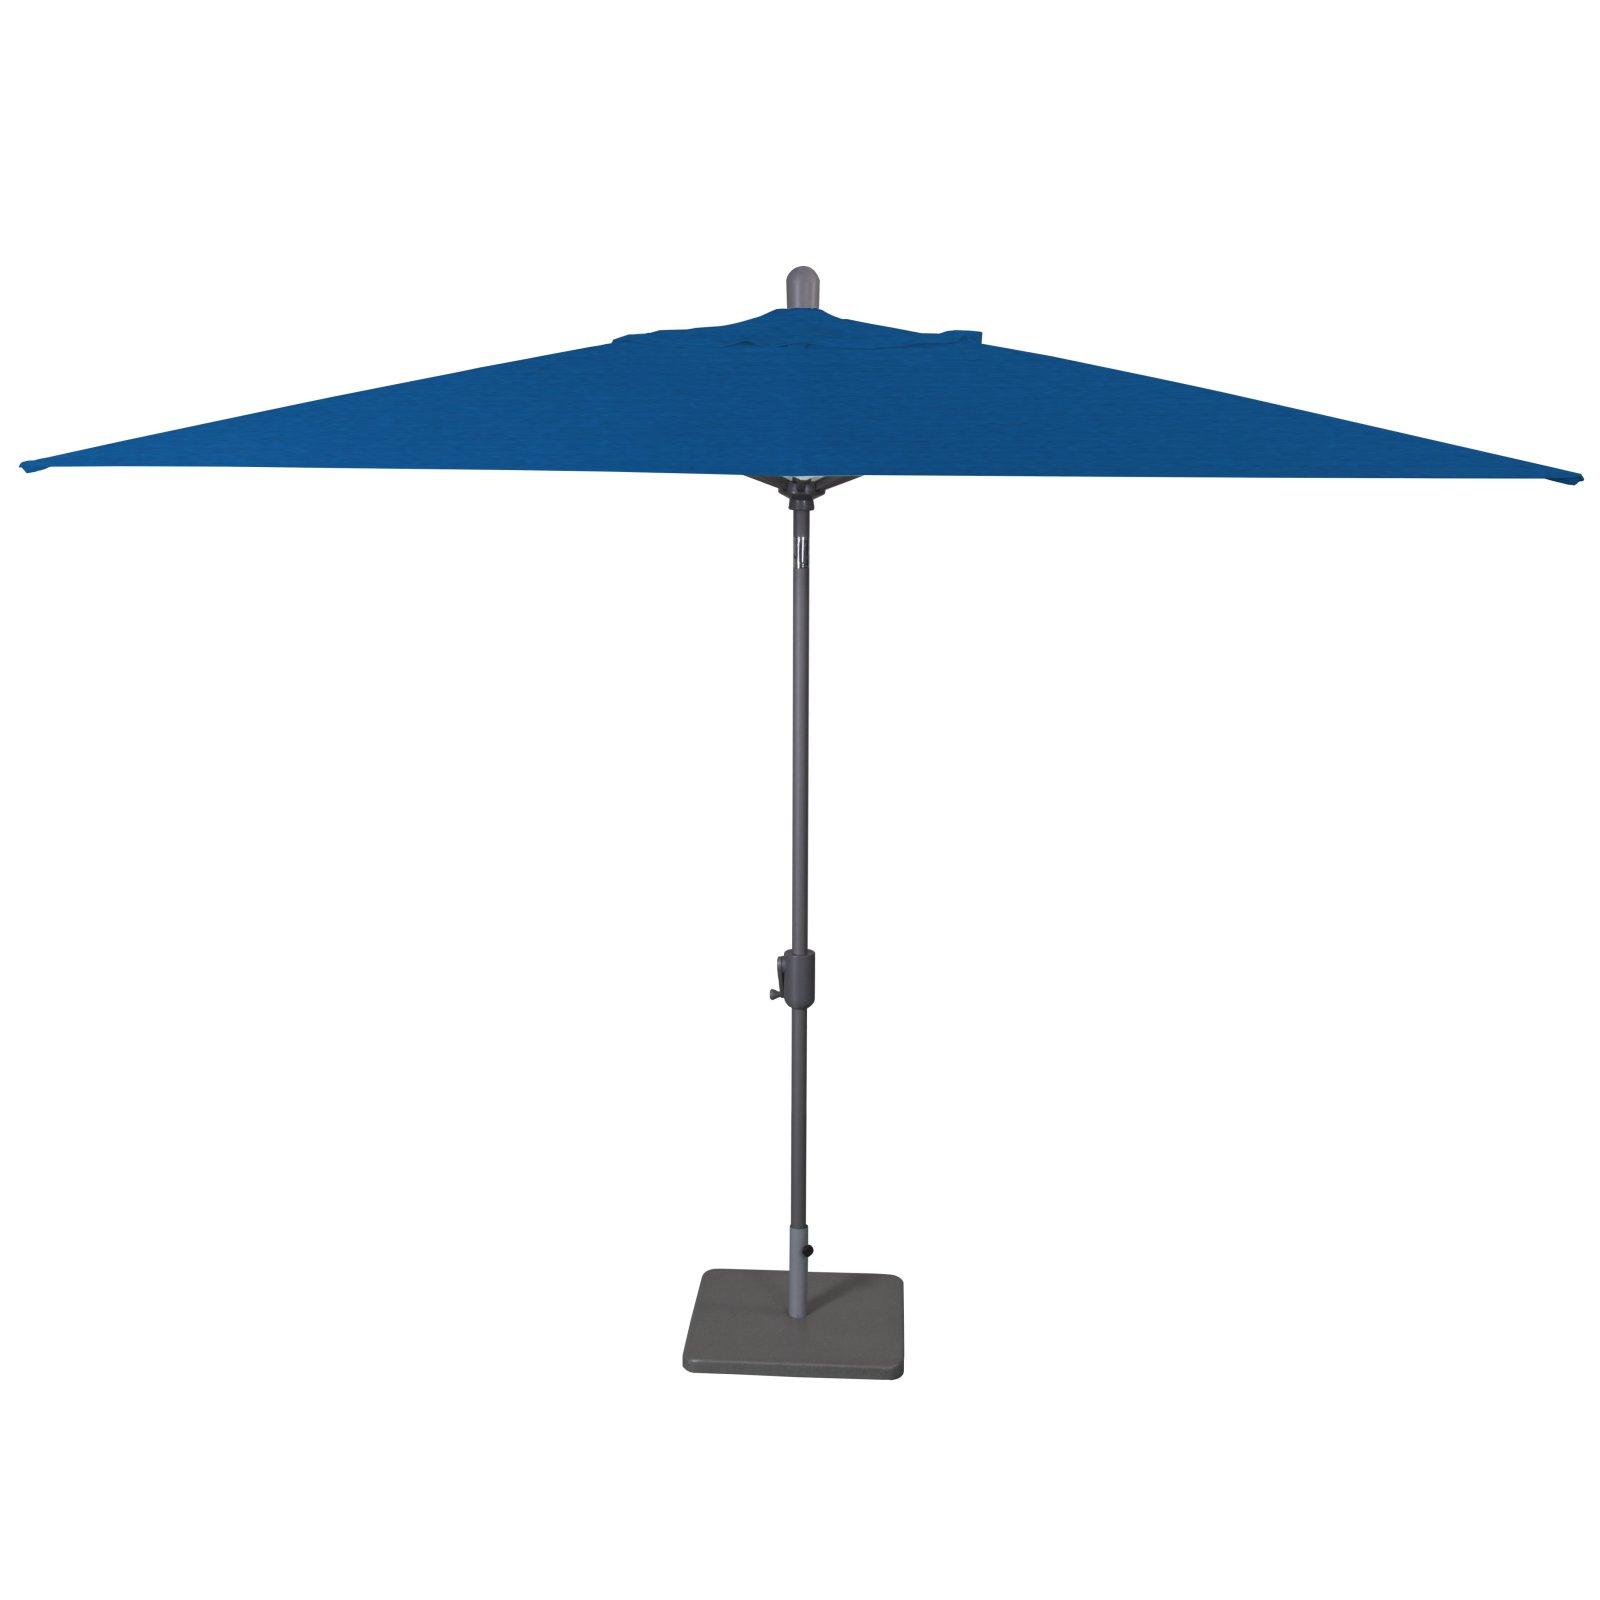 Preferred Mullaney Market Umbrellas In Amauri Laguna Cove 10 Ft. X 6.5 Ft (View 17 of 20)